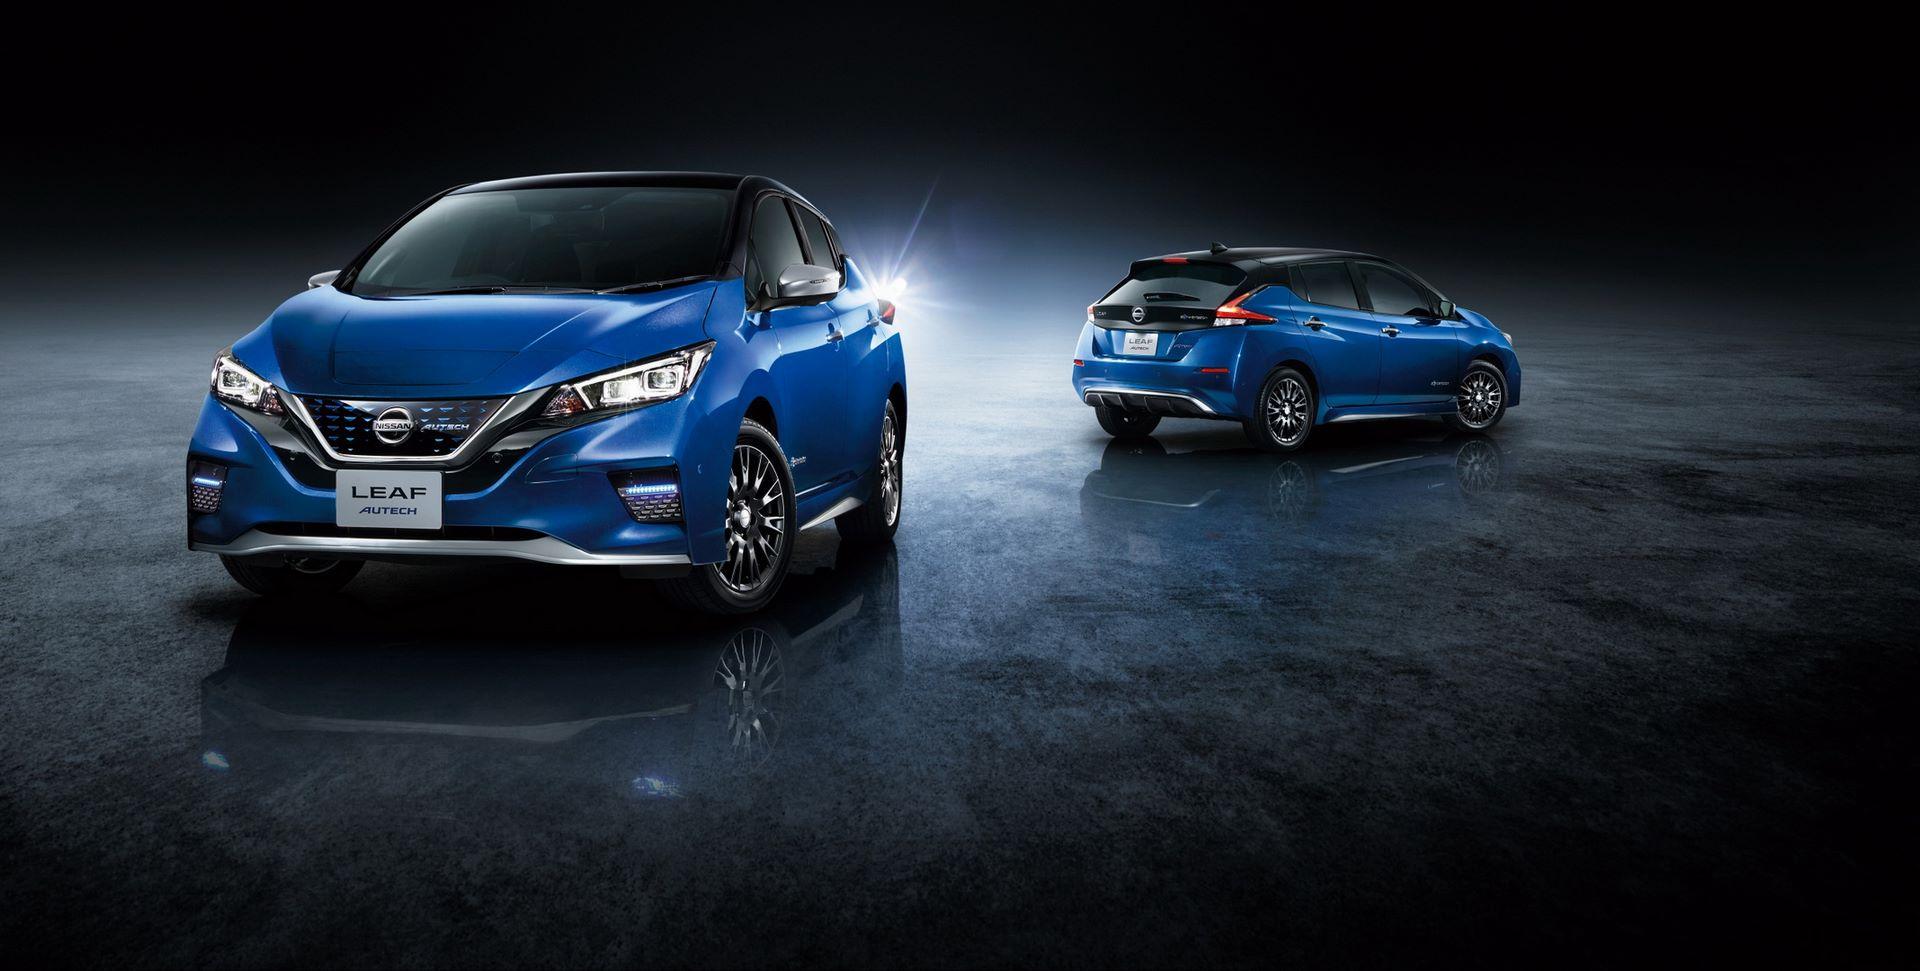 Nissan-leaf-japan-2020-27